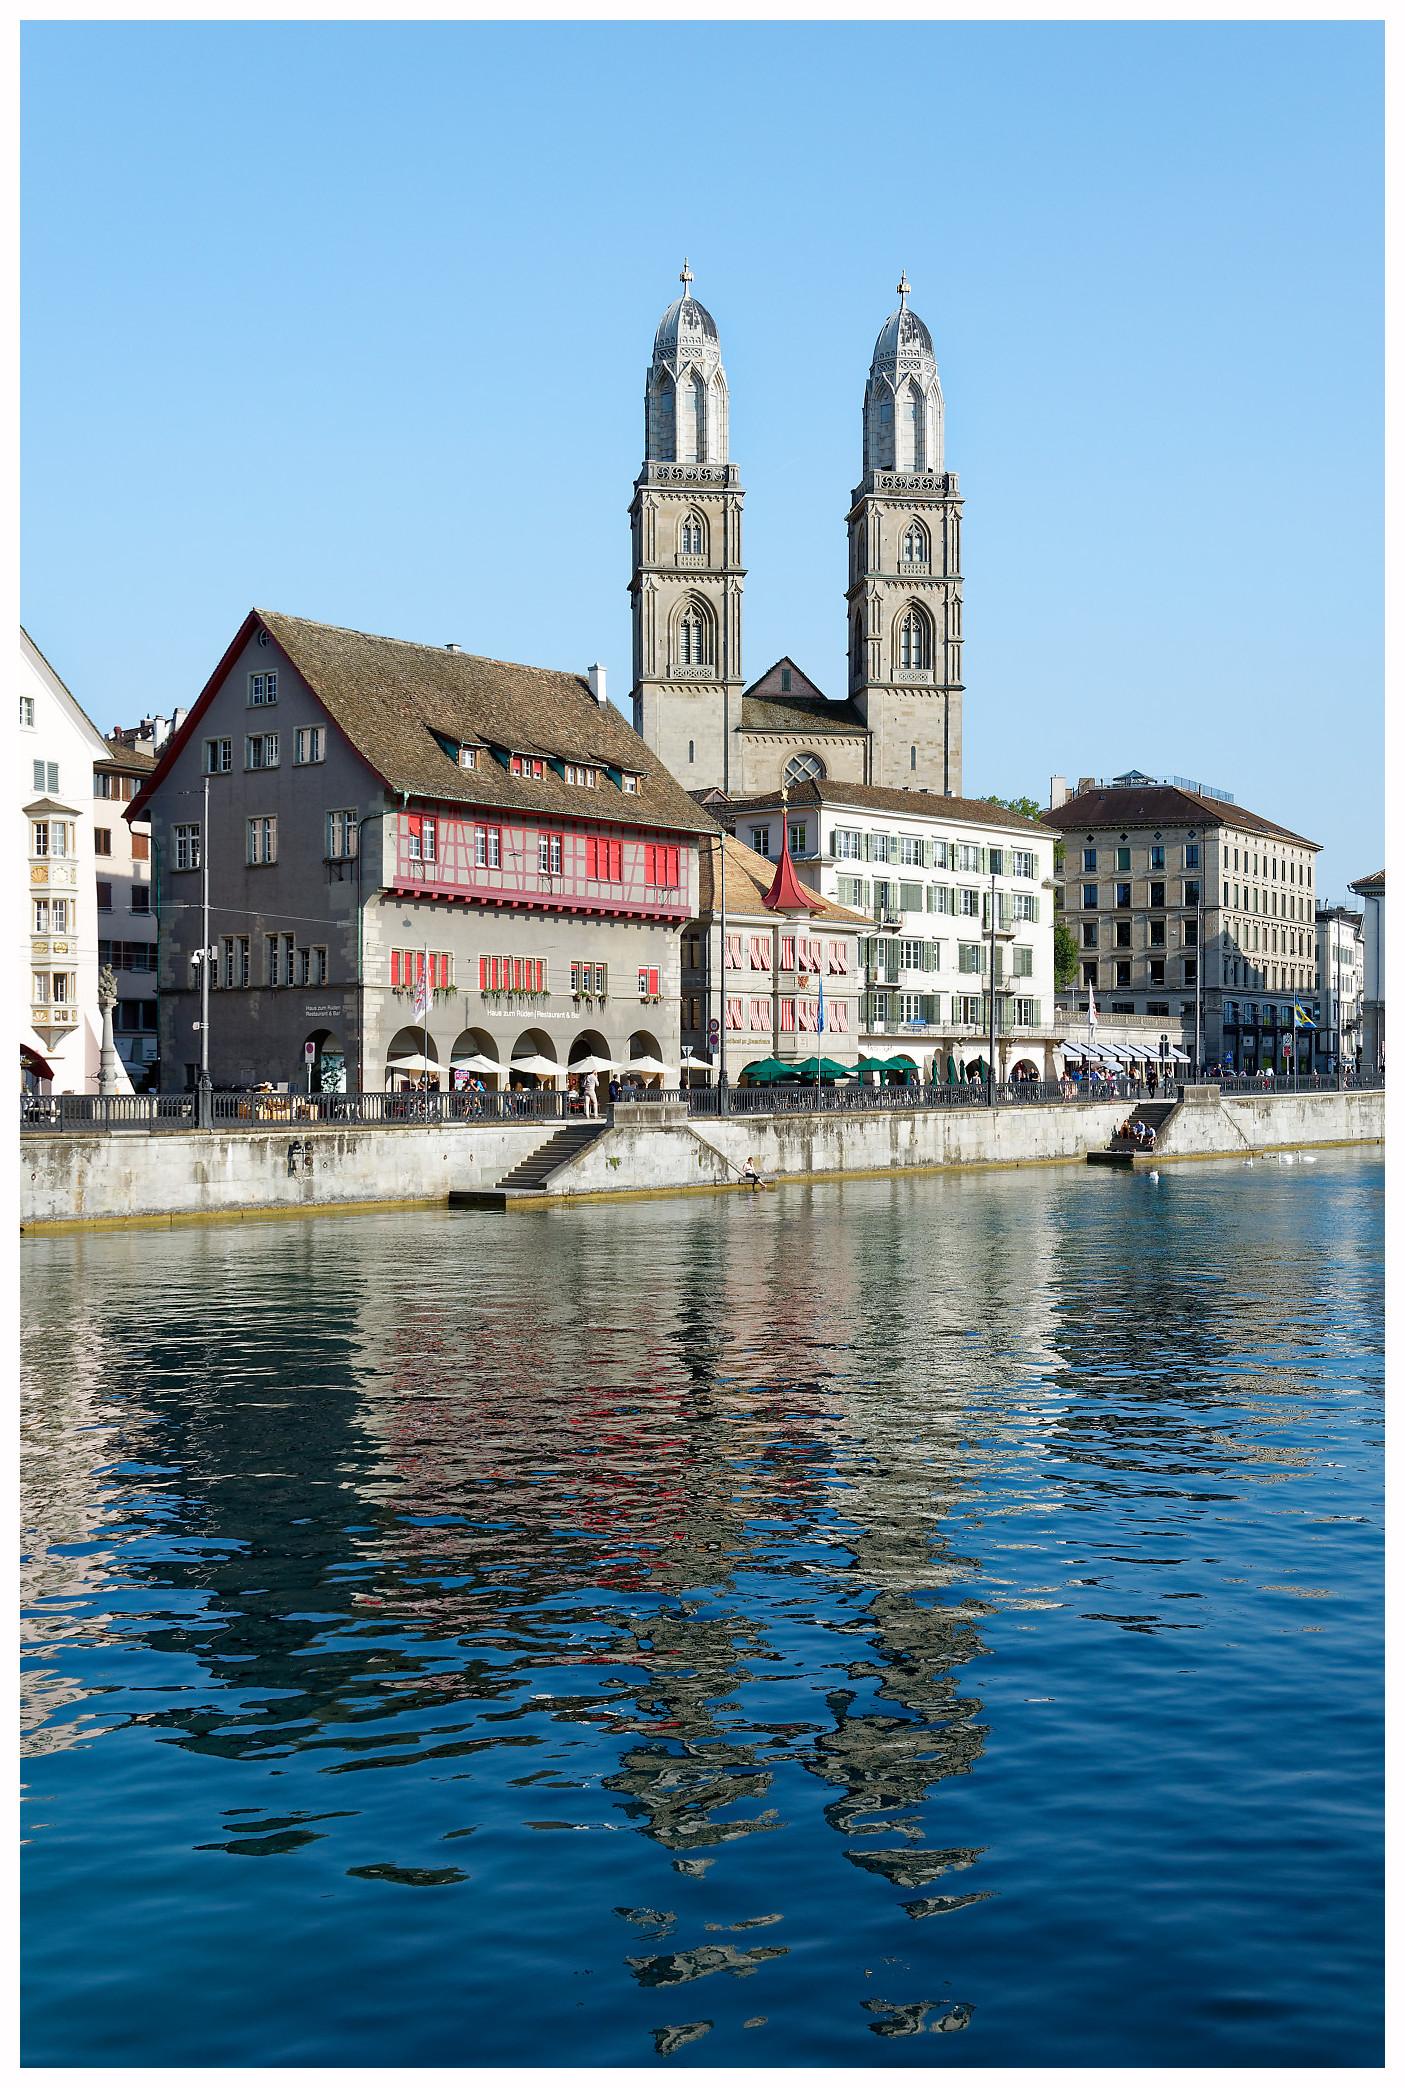 La cathédrâle de Zurich